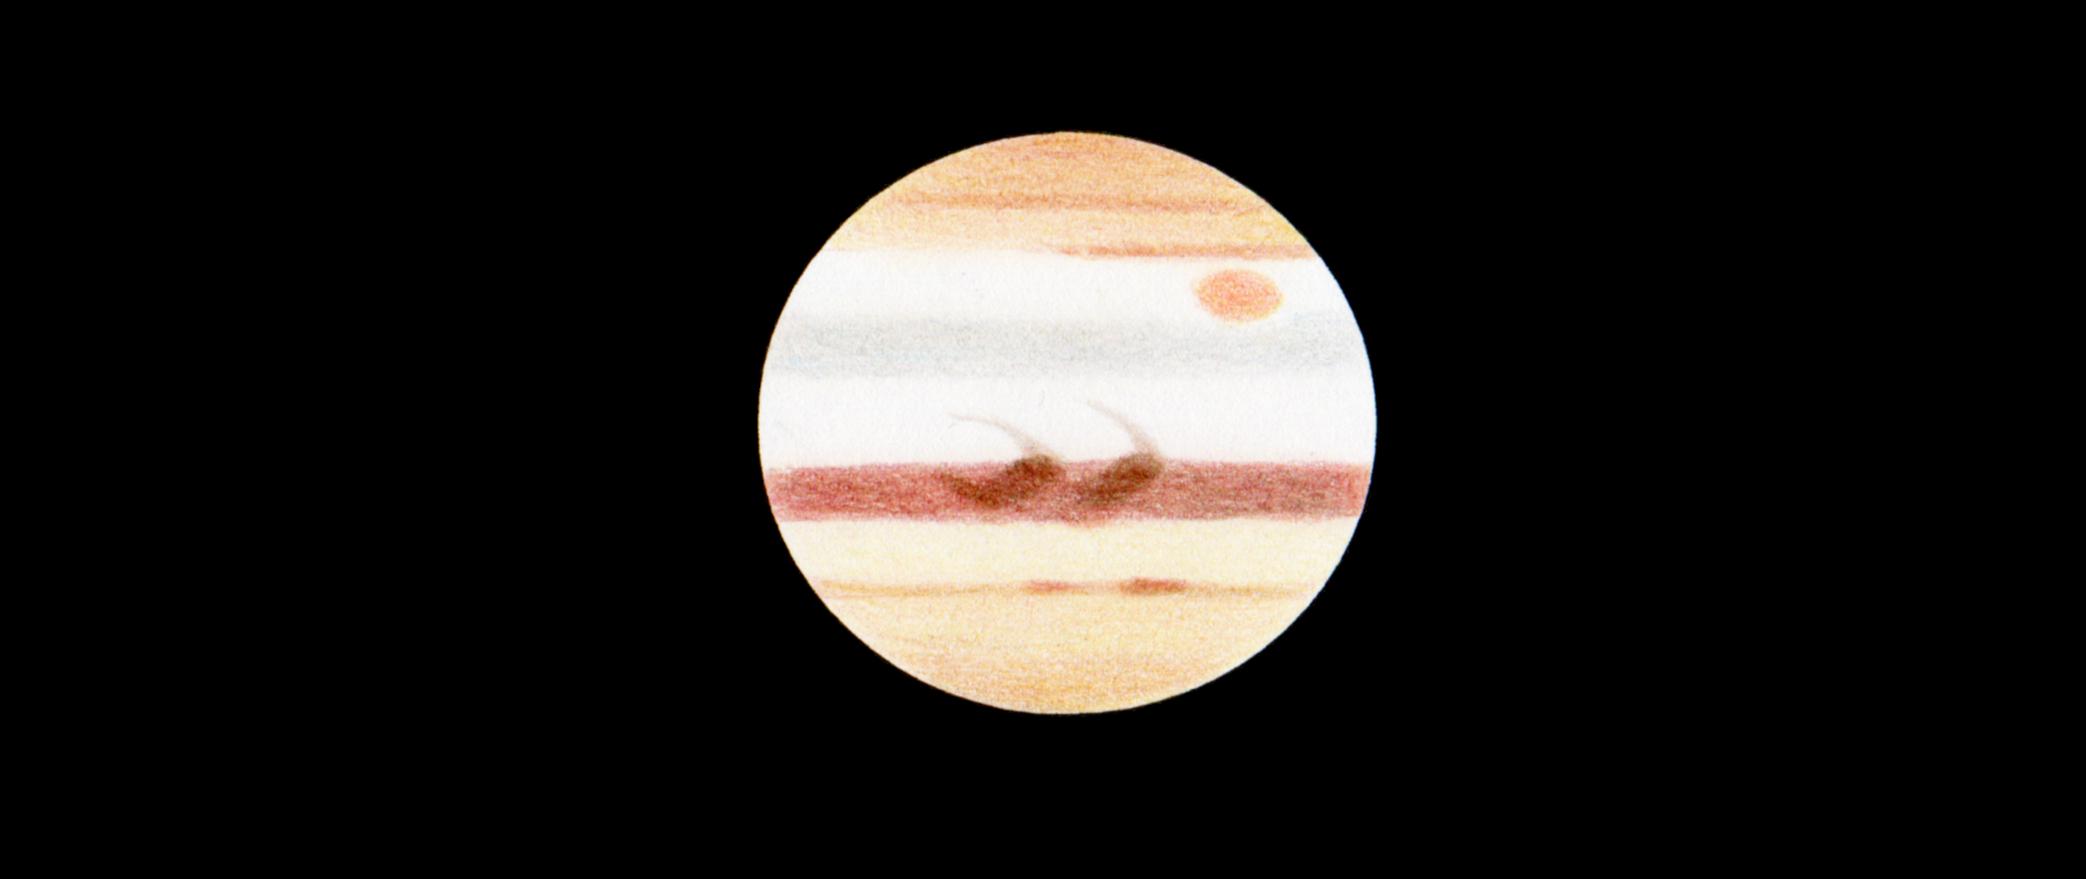 http://ekladata.com/Bmx4-tCmfWRB5rOWTkAlASH77Jc/Jupiter-29-09-2010-T150-22h40.png